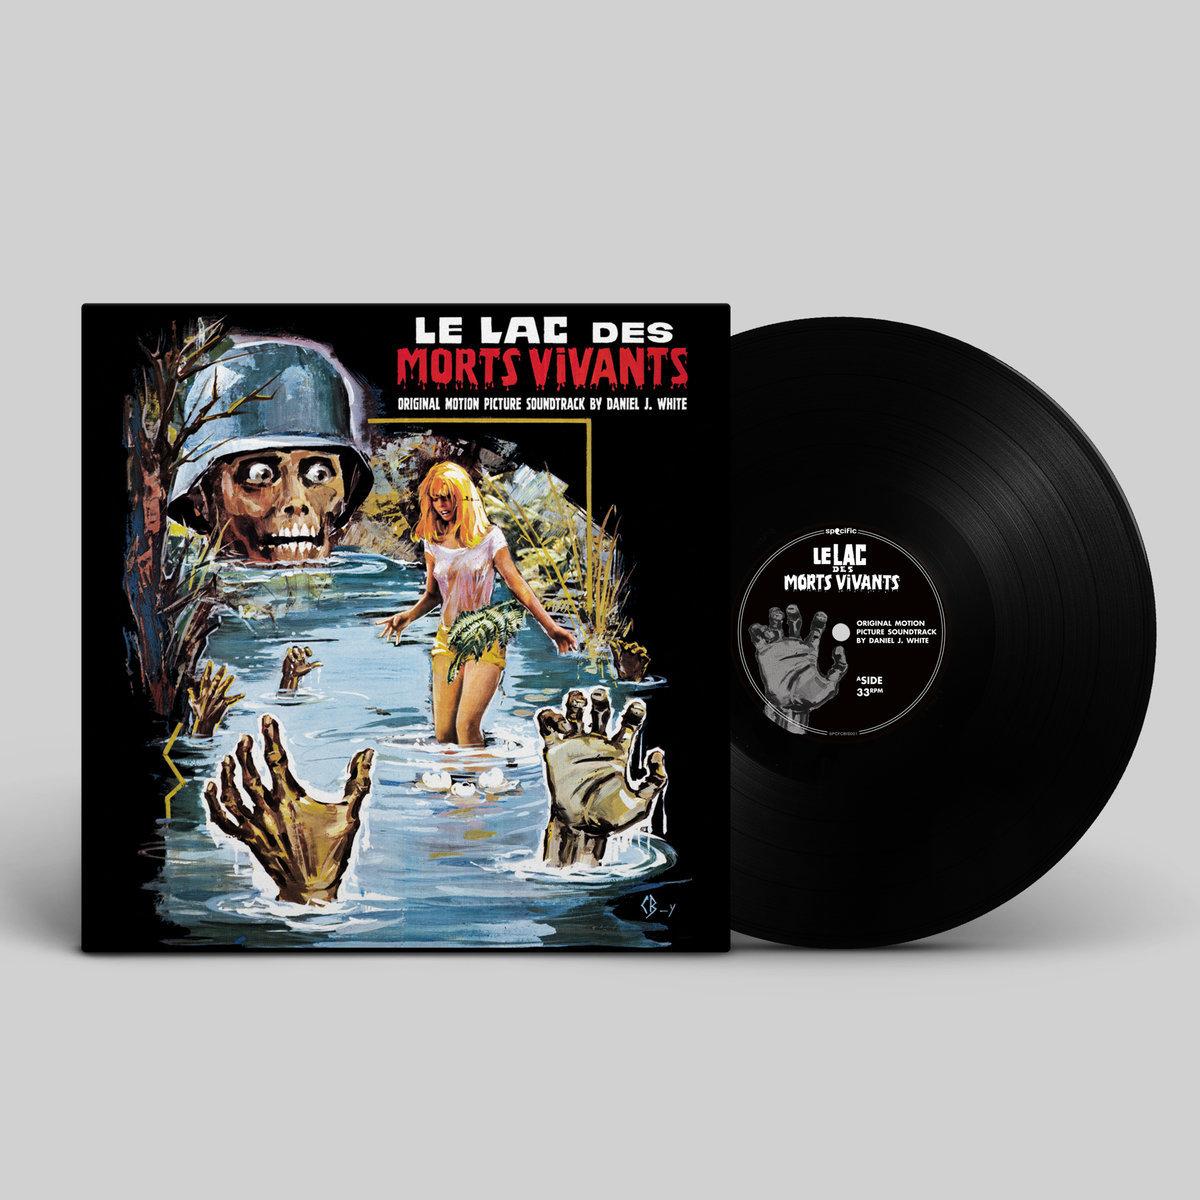 Le Lac Des Morts-Vivants (aka Zombie Lake) | Specific Recordings